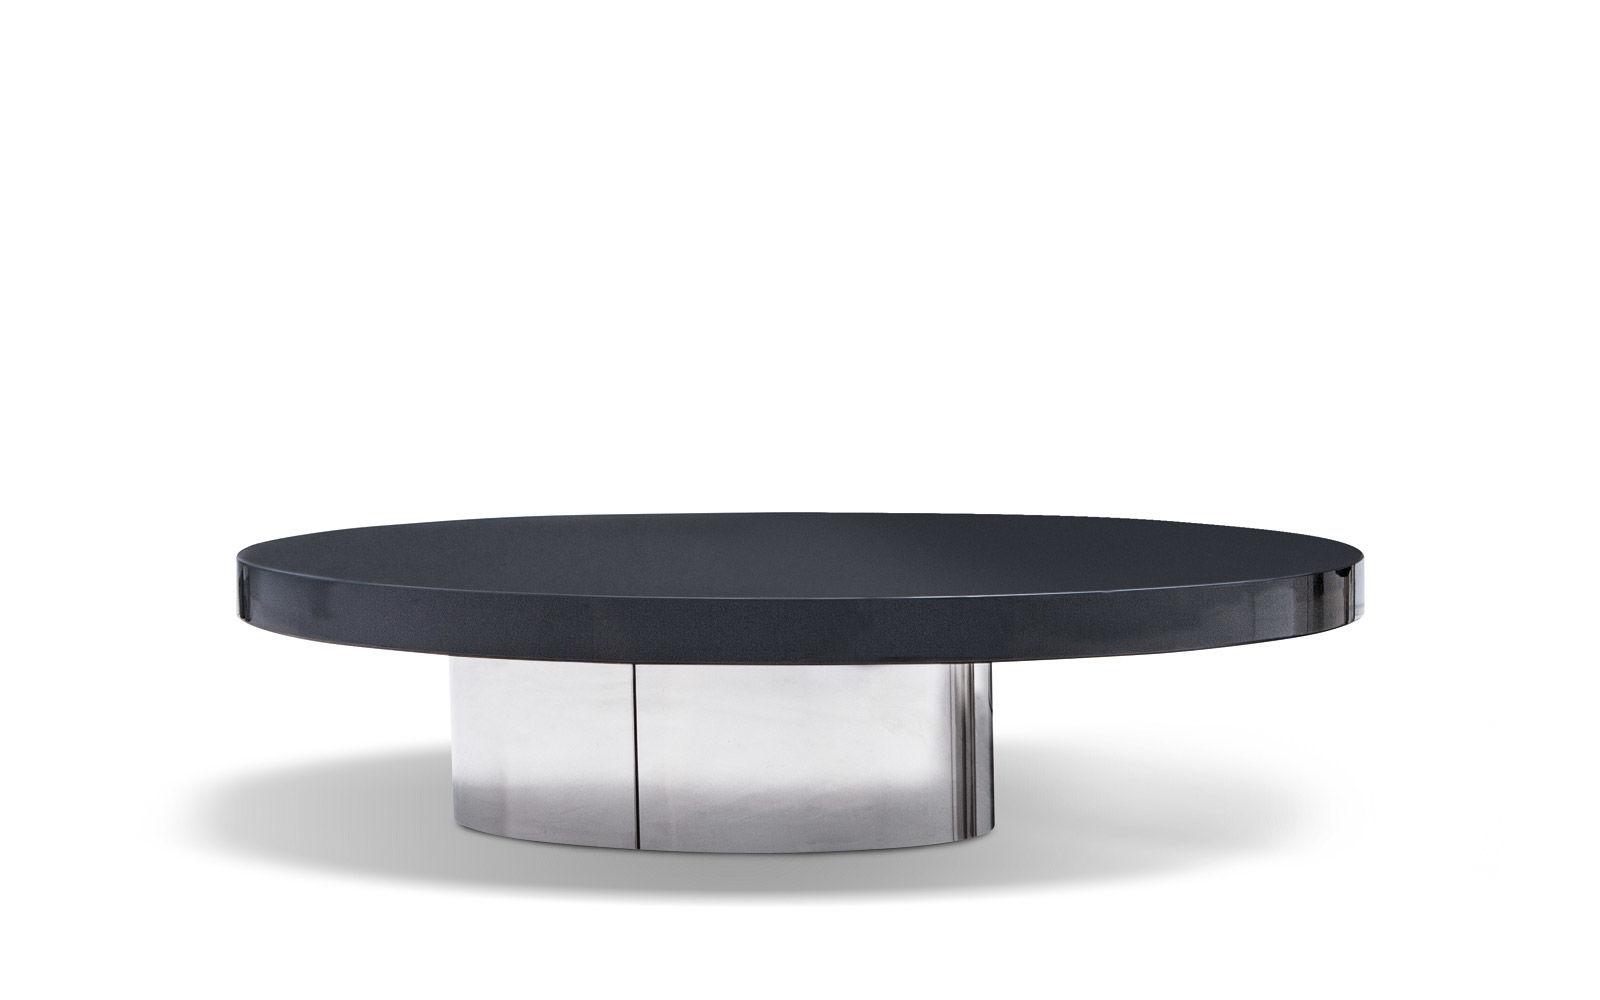 COFFEE TABLES - EN | RAYMOND top 25 stunning center table ideas Top 25 Stunning Center Table Ideas 13893 z RAYMOND SCONT